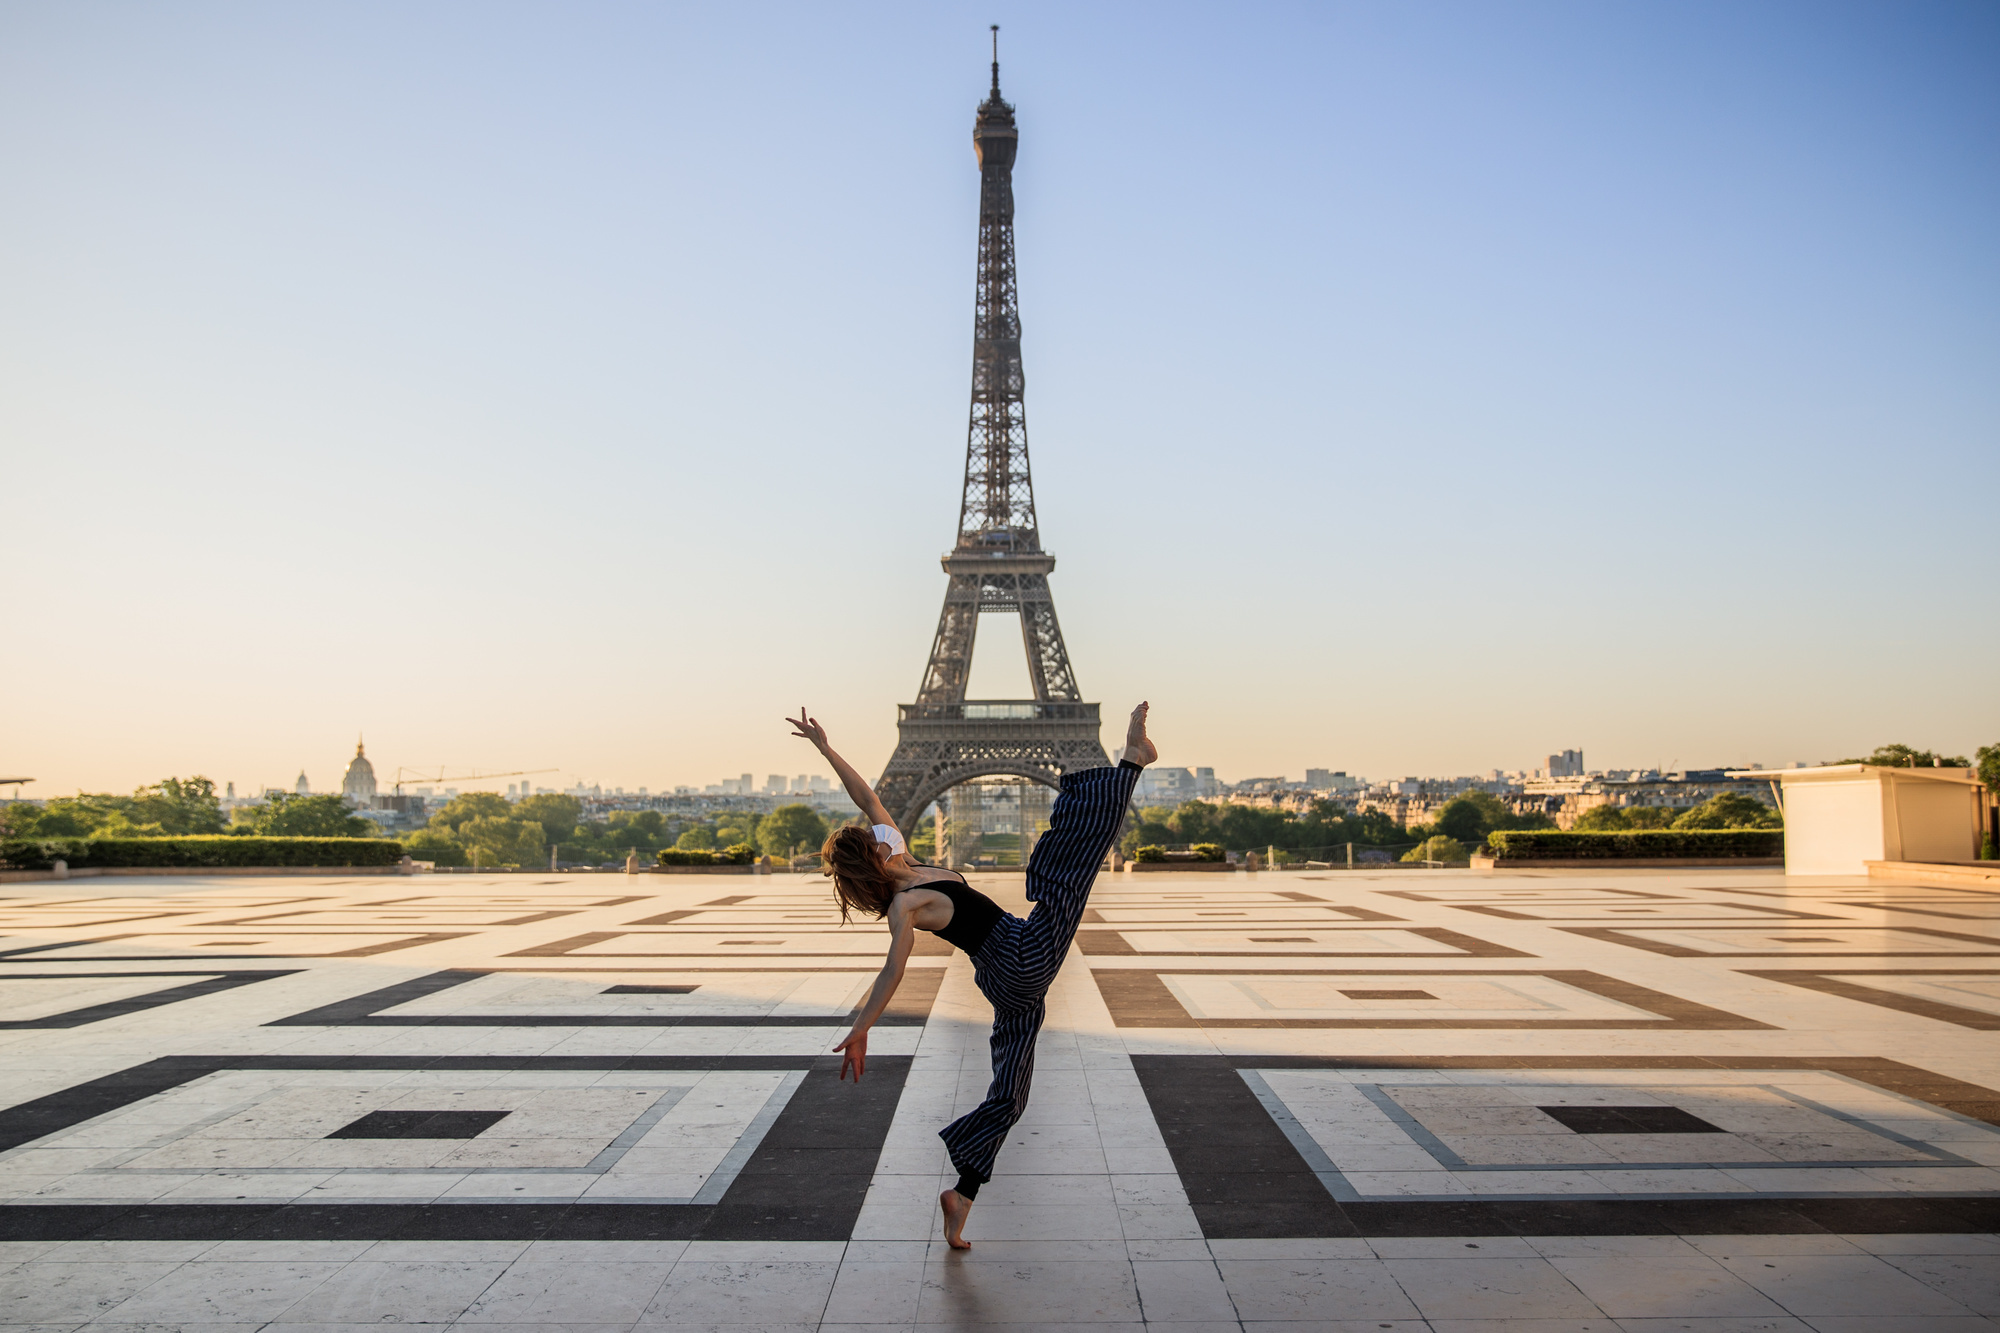 Yara al-Hasbani devant la Tour Eiffel, belga